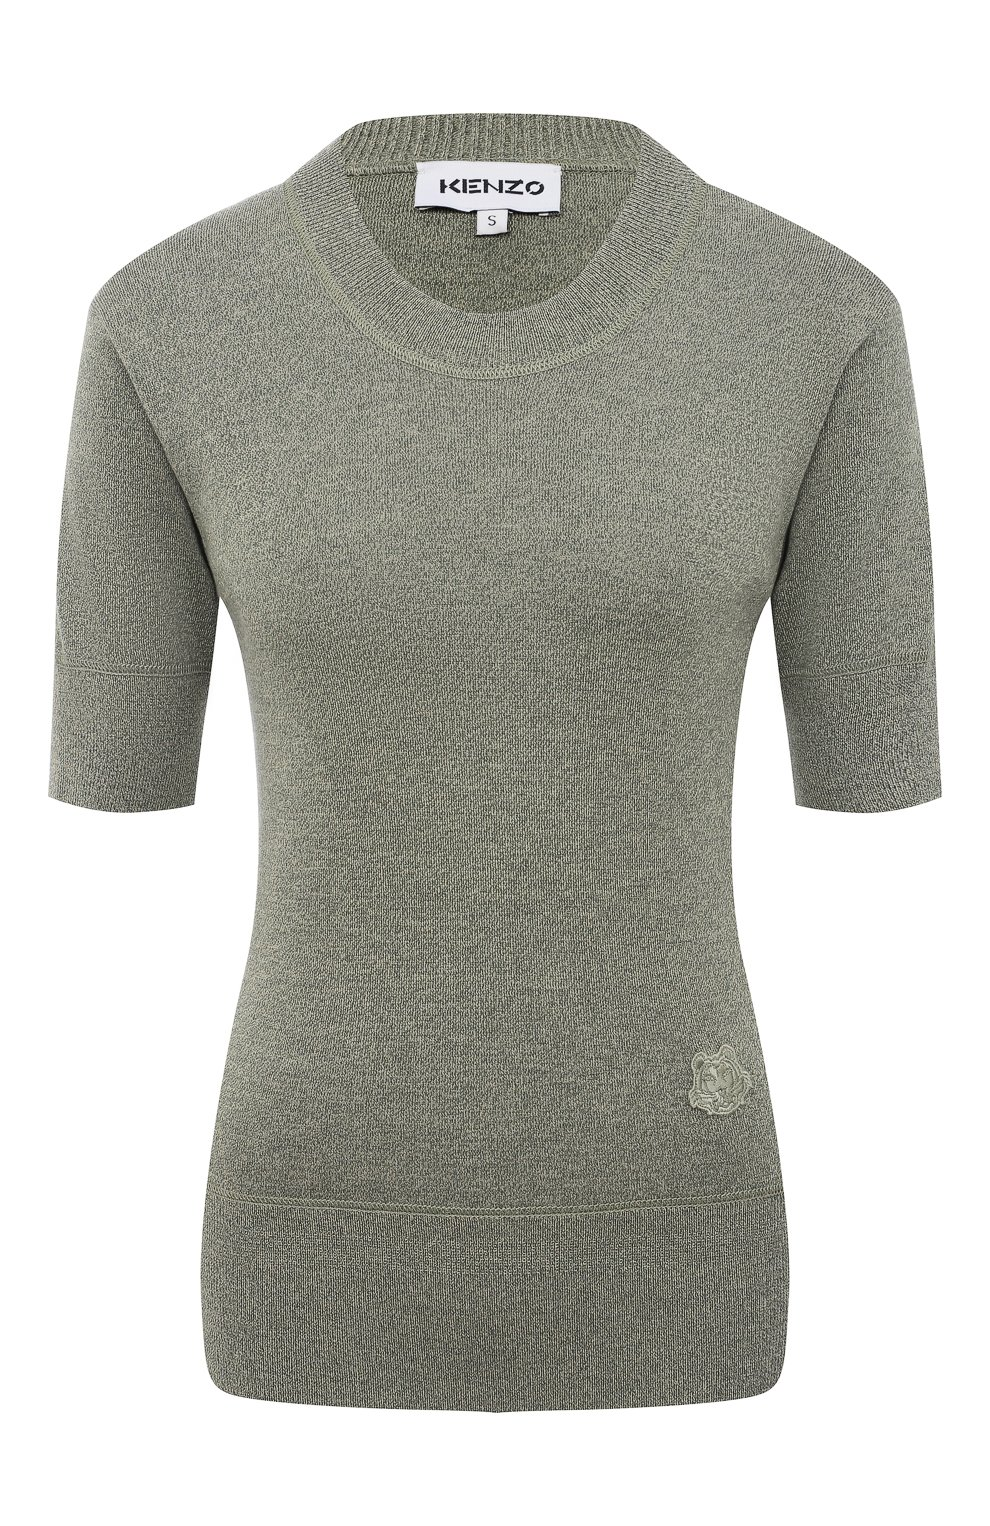 Женский пуловер из шерсти и хлопка KENZO хаки цвета, арт. FB52PU5553AB | Фото 1